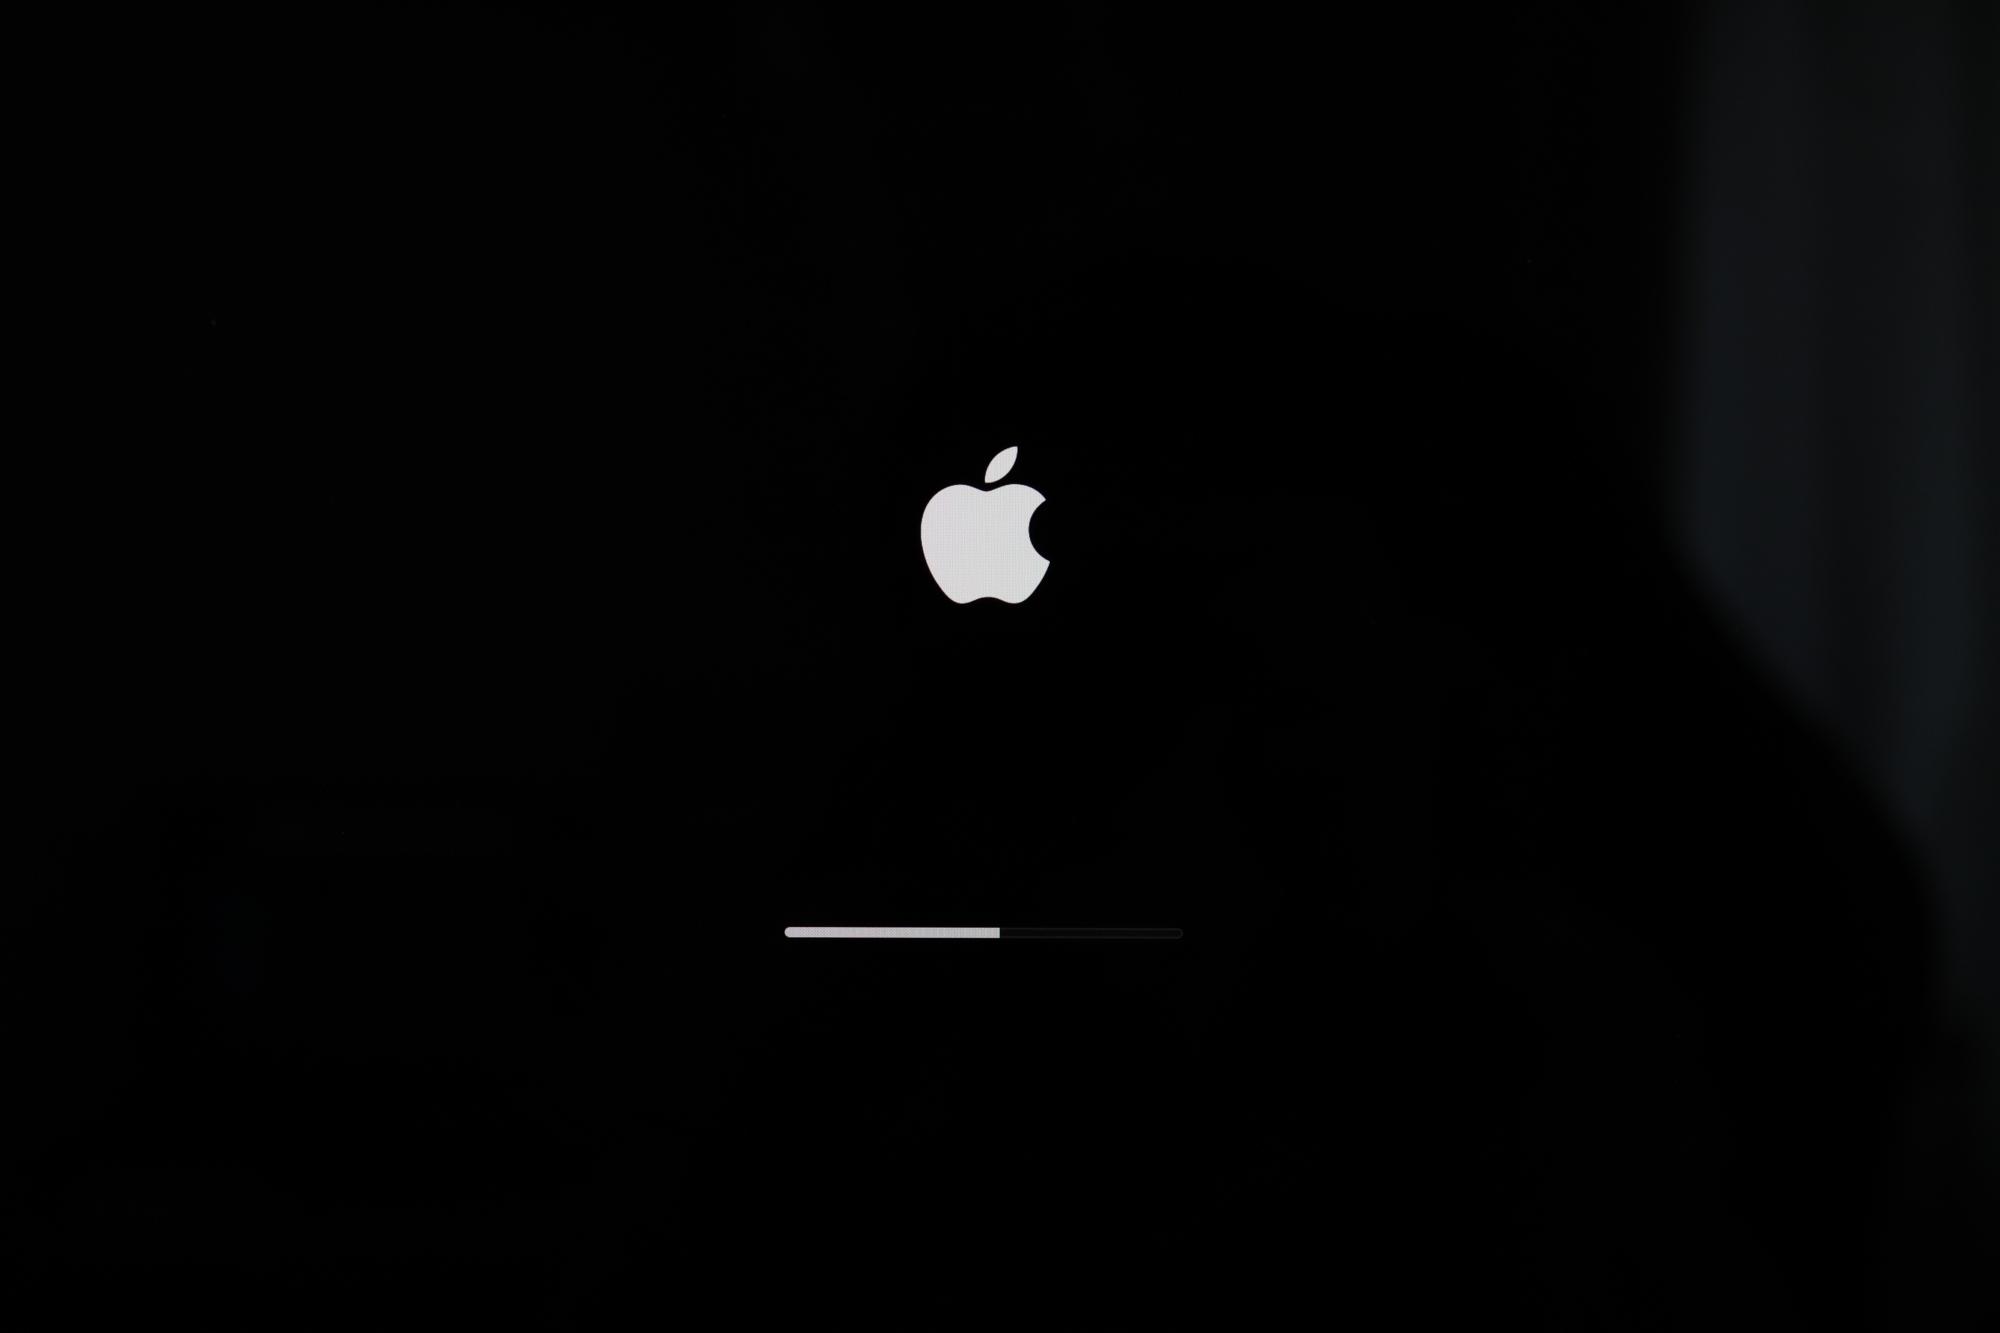 macOS 起動画面